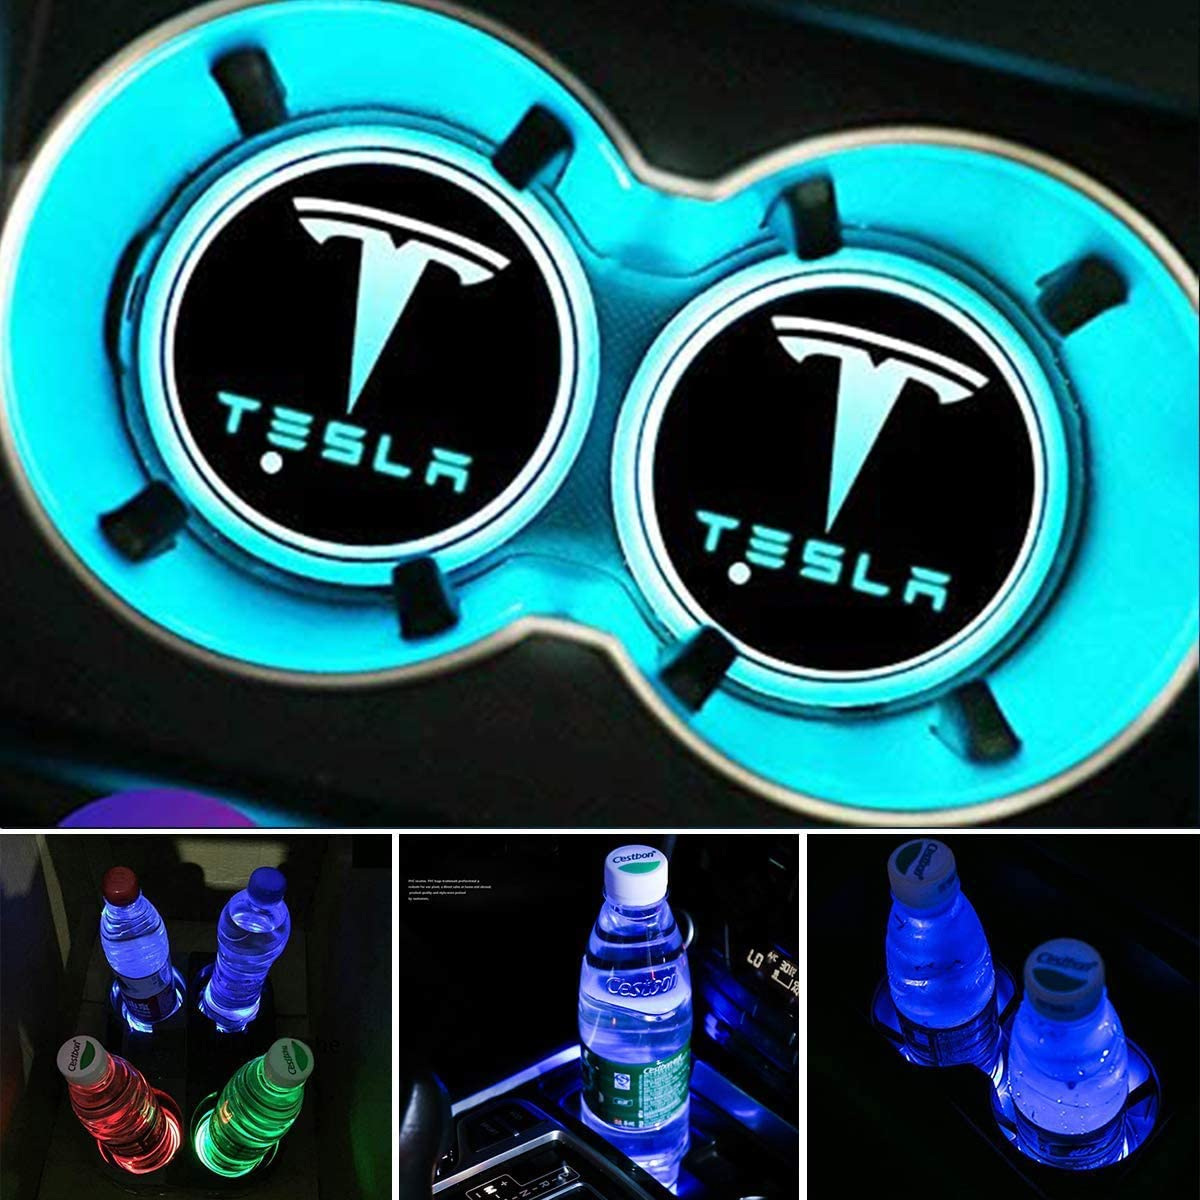 topfit Tesla Modelo 3 Modelo S Modelo X LED Portavasos para coche Luz USB recargable Coj/ín de copa luminiscente 7 colores L/ámpara de ambiente Luz de decoraci/ón interior 2 piezas por juego